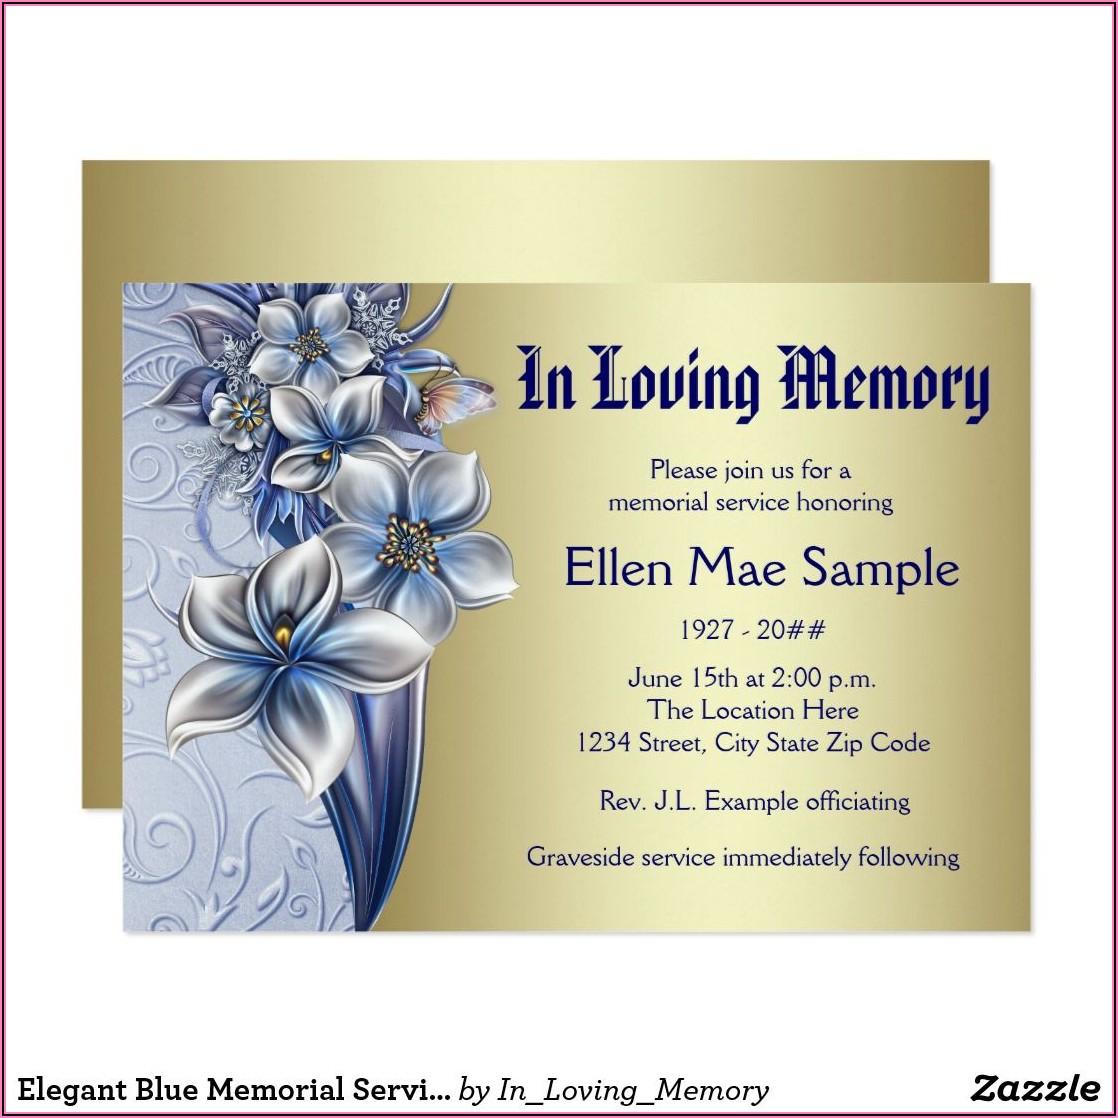 Memorial Service Announcement Examples